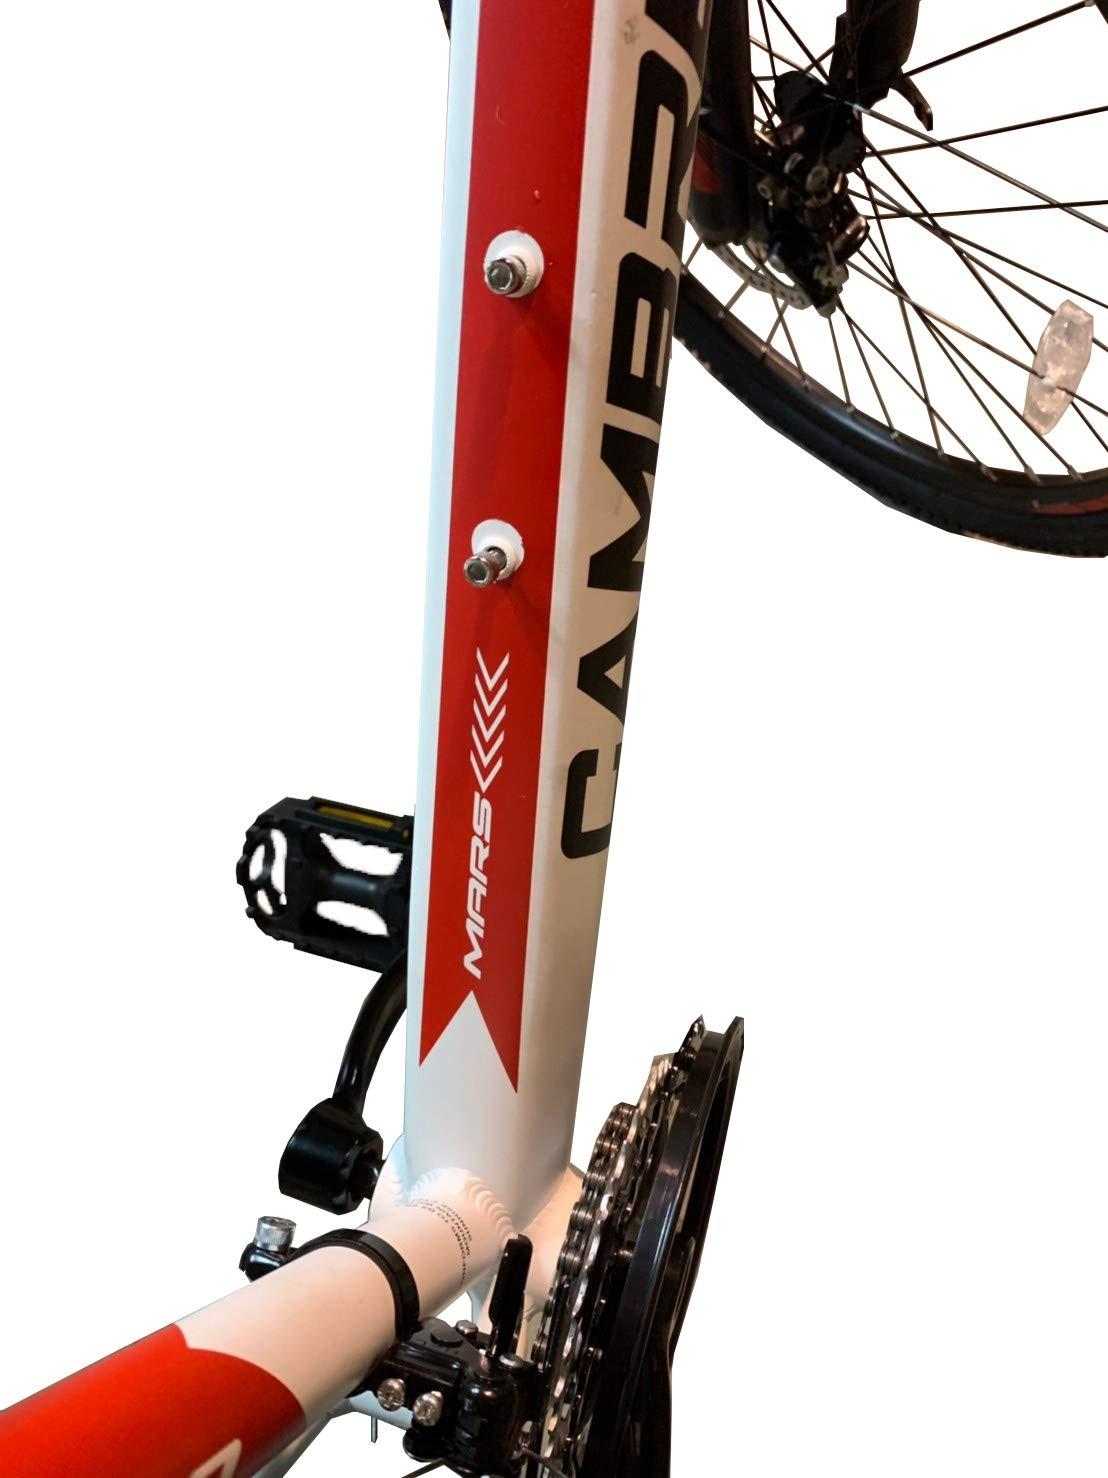 Y660 Mars Cycles Mountain Bike//Bicycles 26 wheel Lightweight Aluminium Frame 21 Speeds SHIMANO Disc Brake